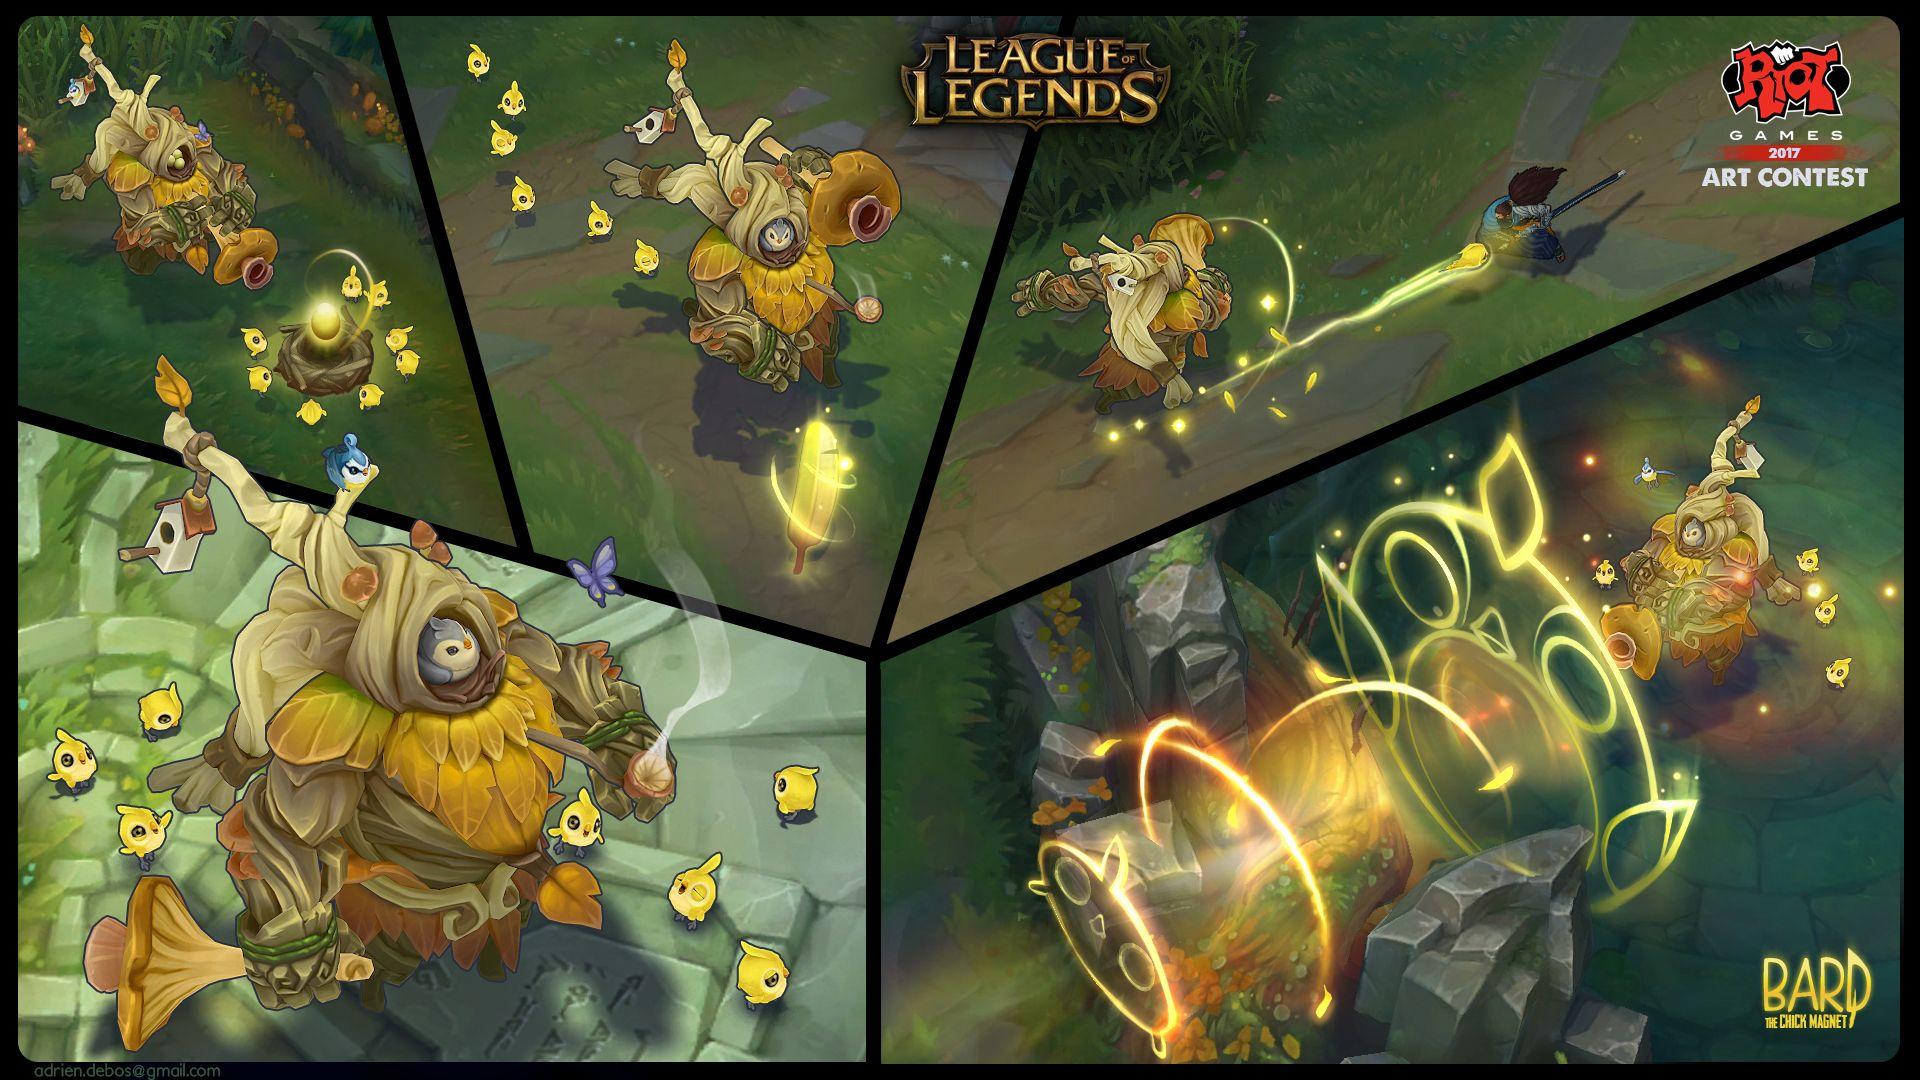 Pin on League of Legends Concept Art